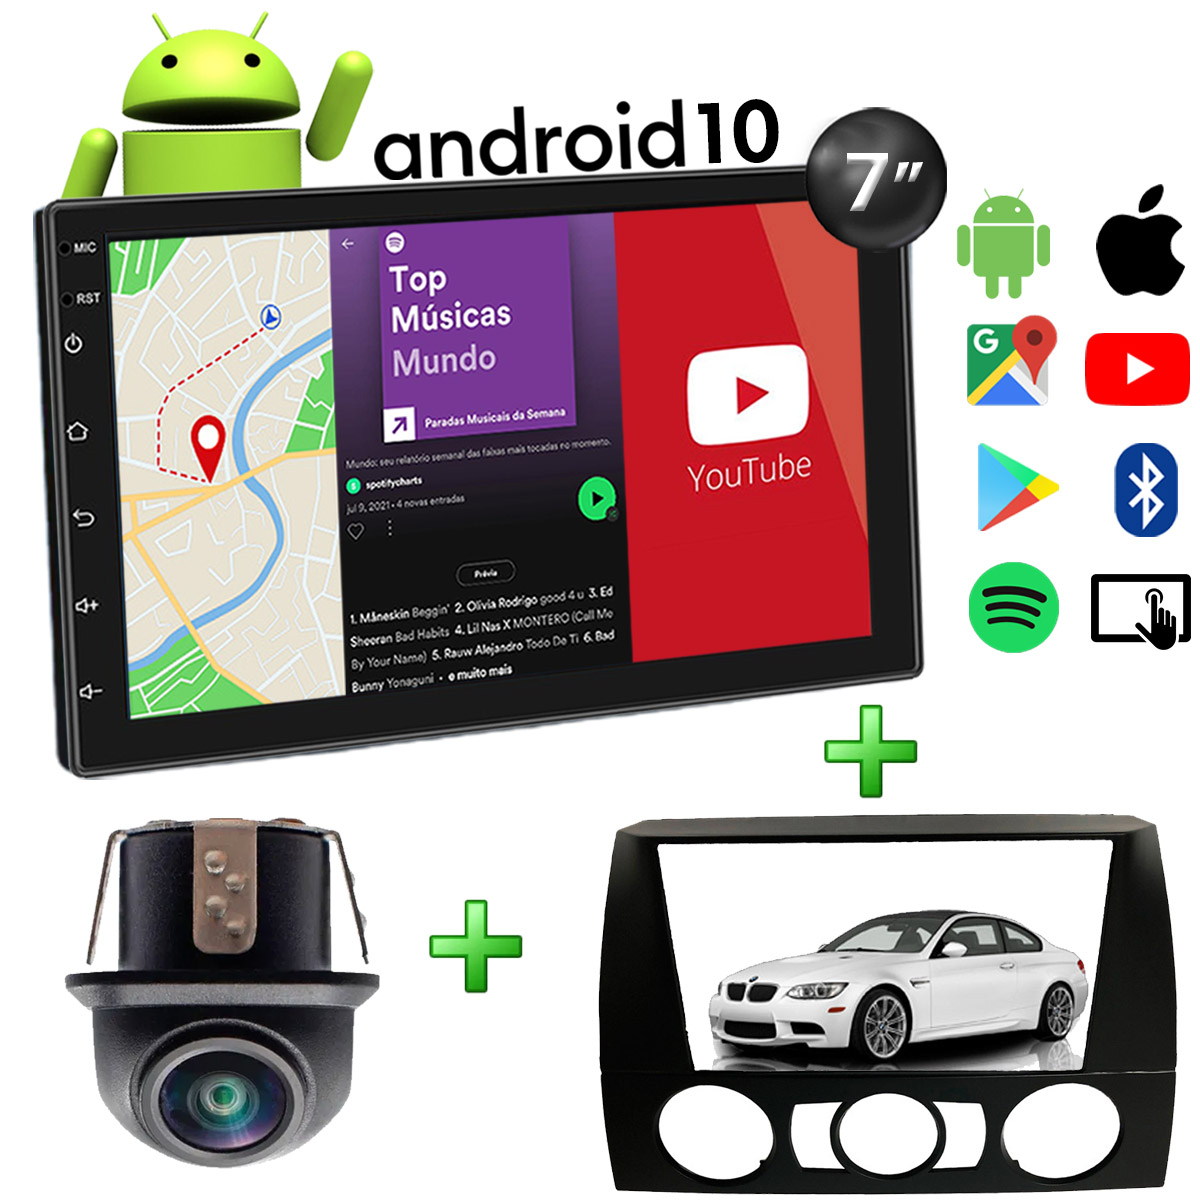 Central Multimídia BMW Series 3 Muzik Android com Câmera 7 Polegadas 2 Din Moldura Preta Poliparts